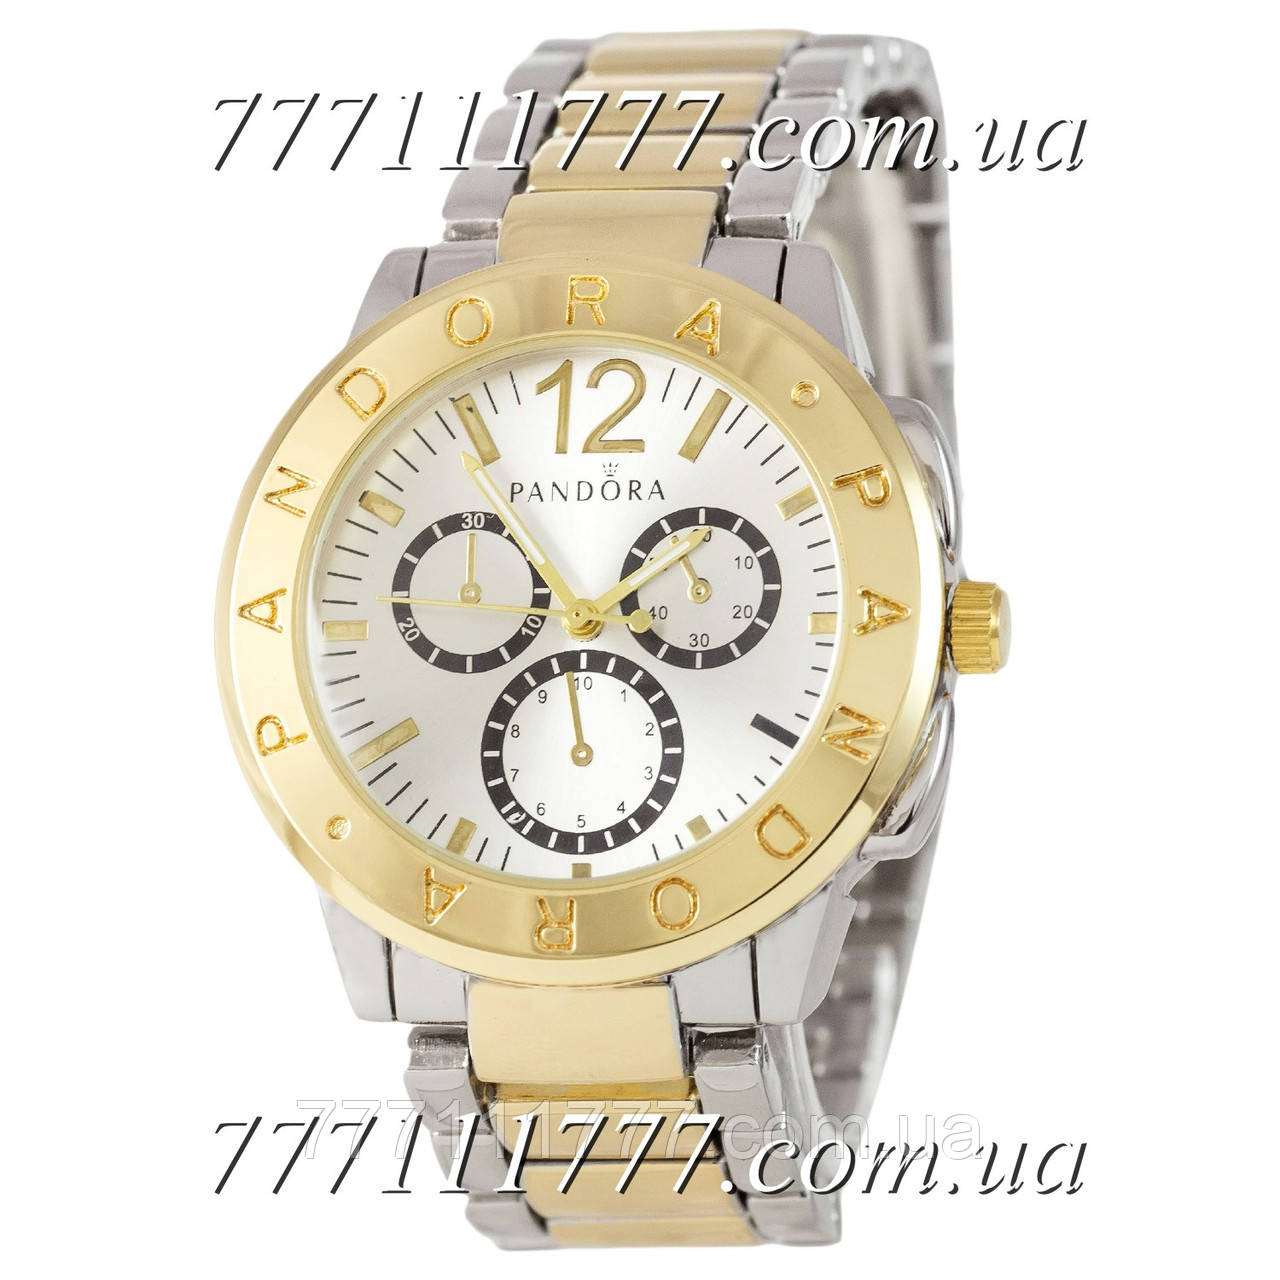 961938606c50 Часы мужские наручные Pandora Сircle Silver-Gold-Silver  продажа ...